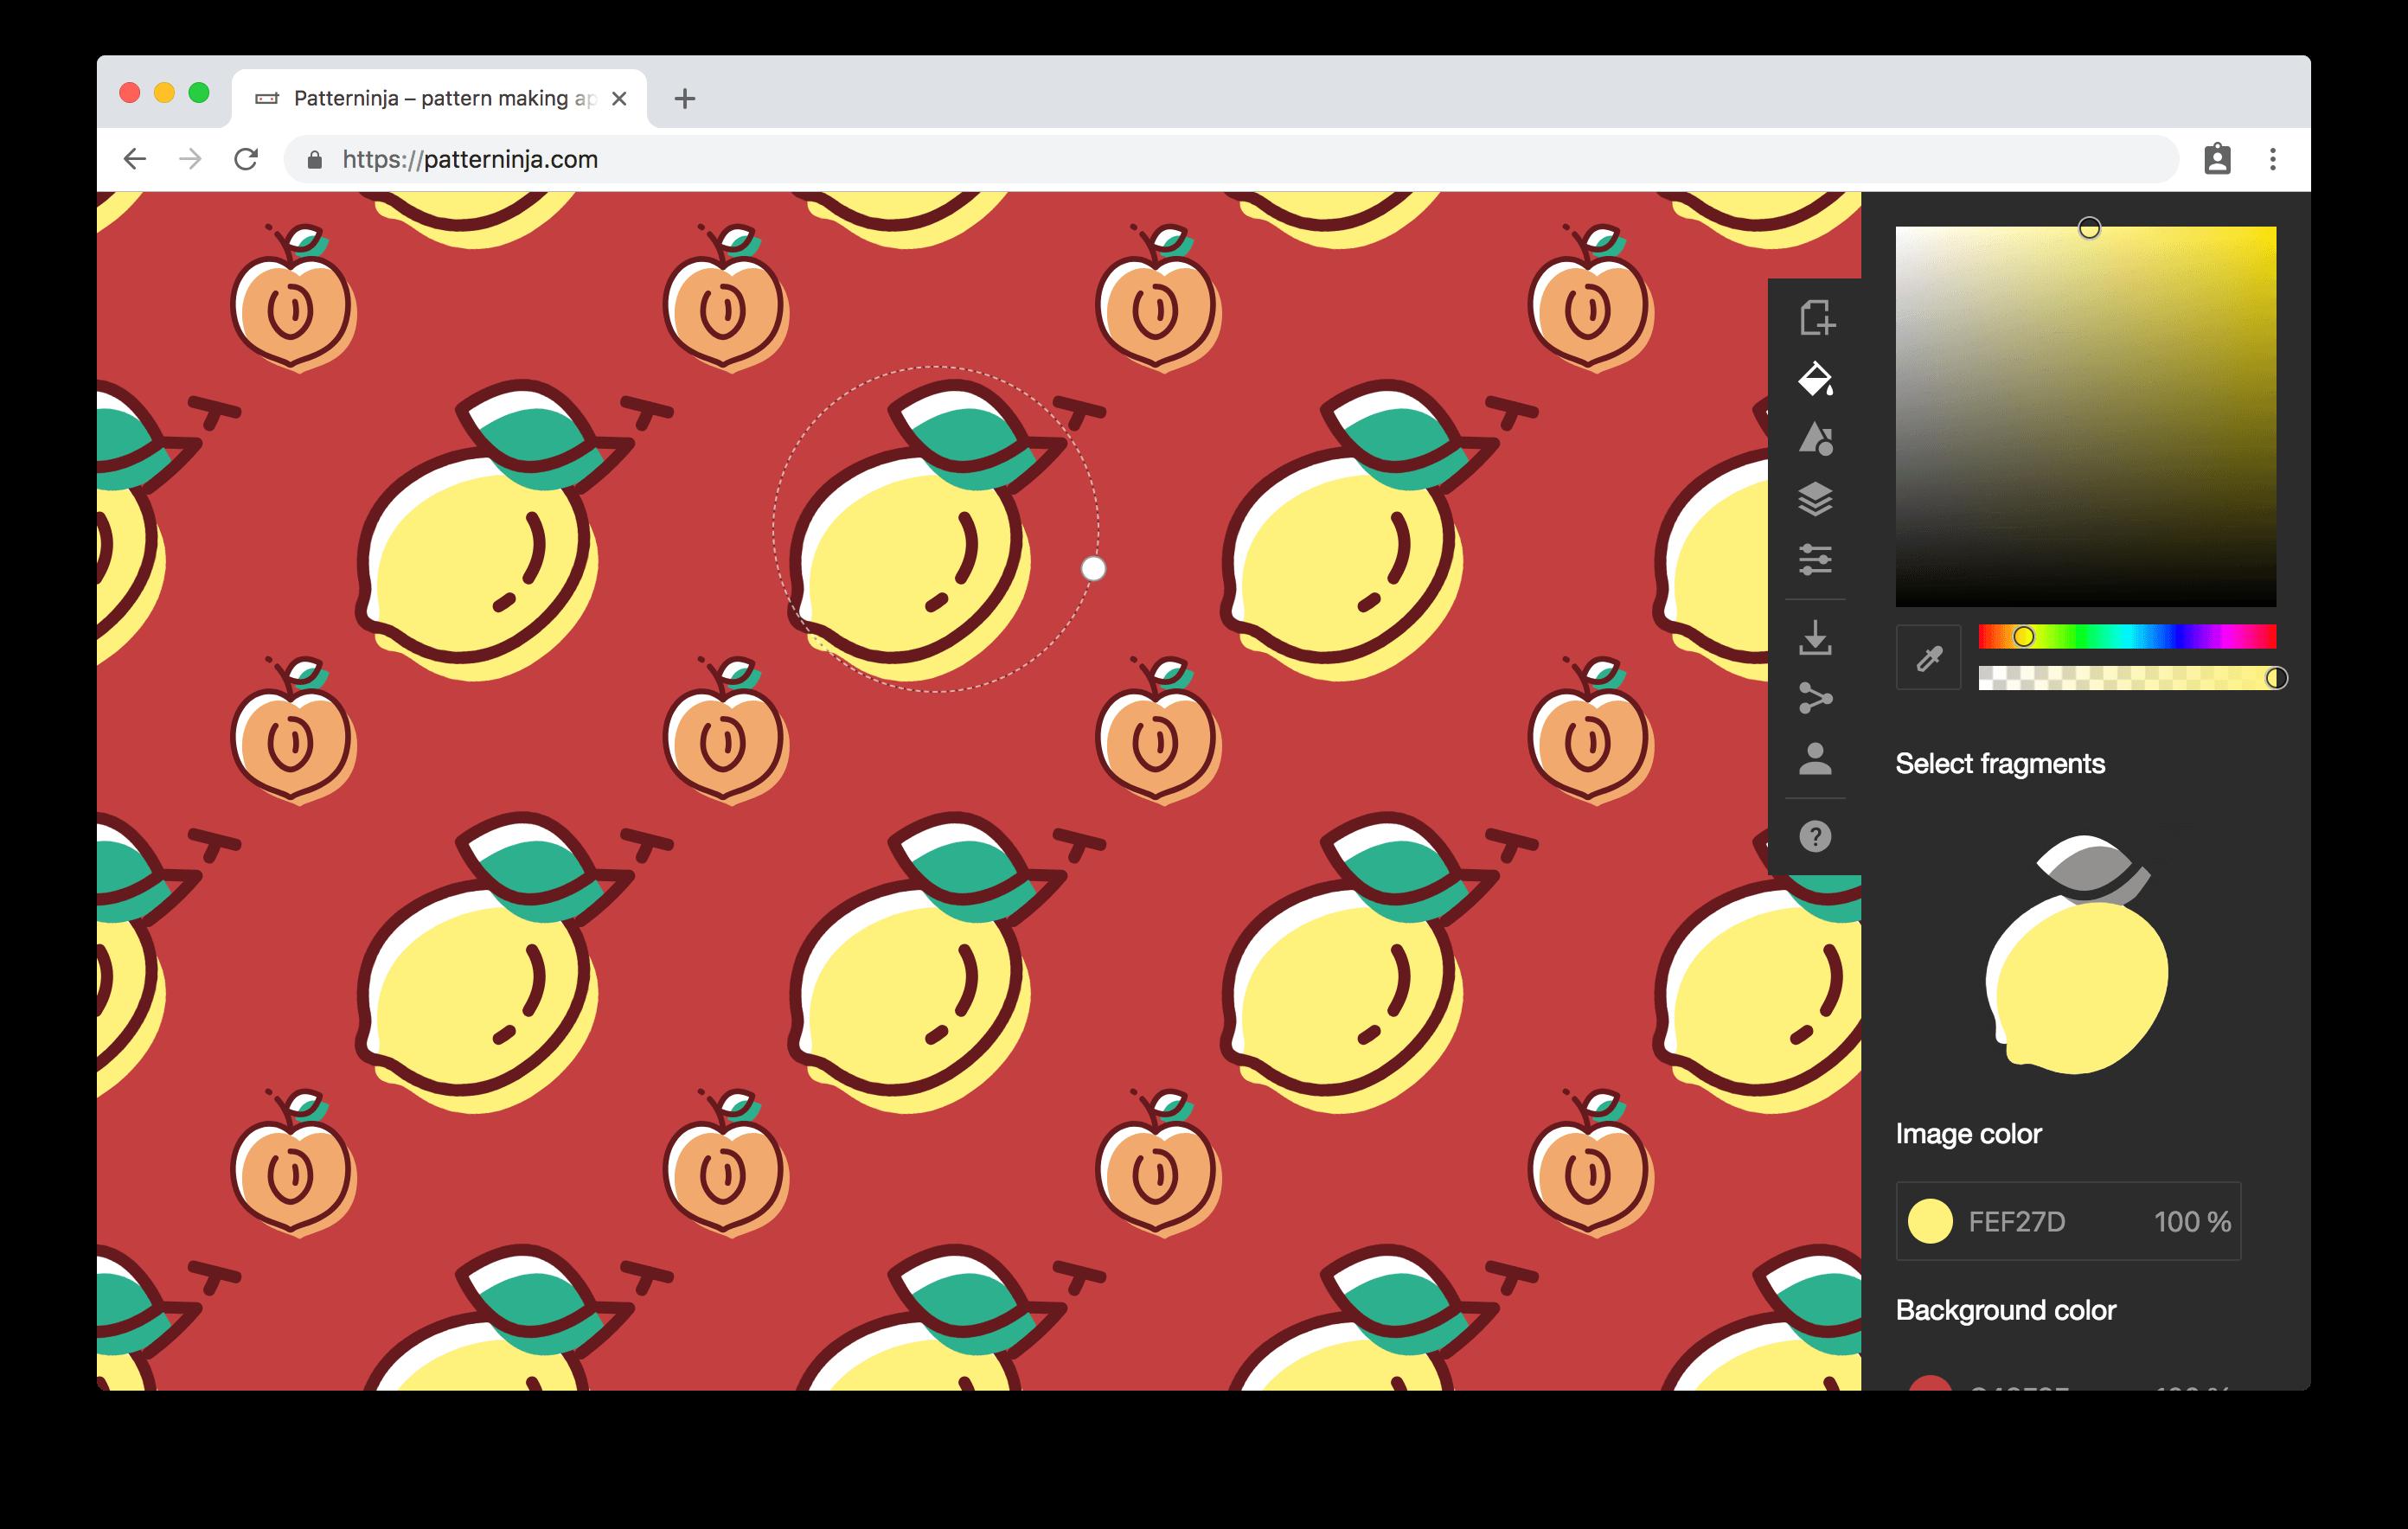 patterninja.com